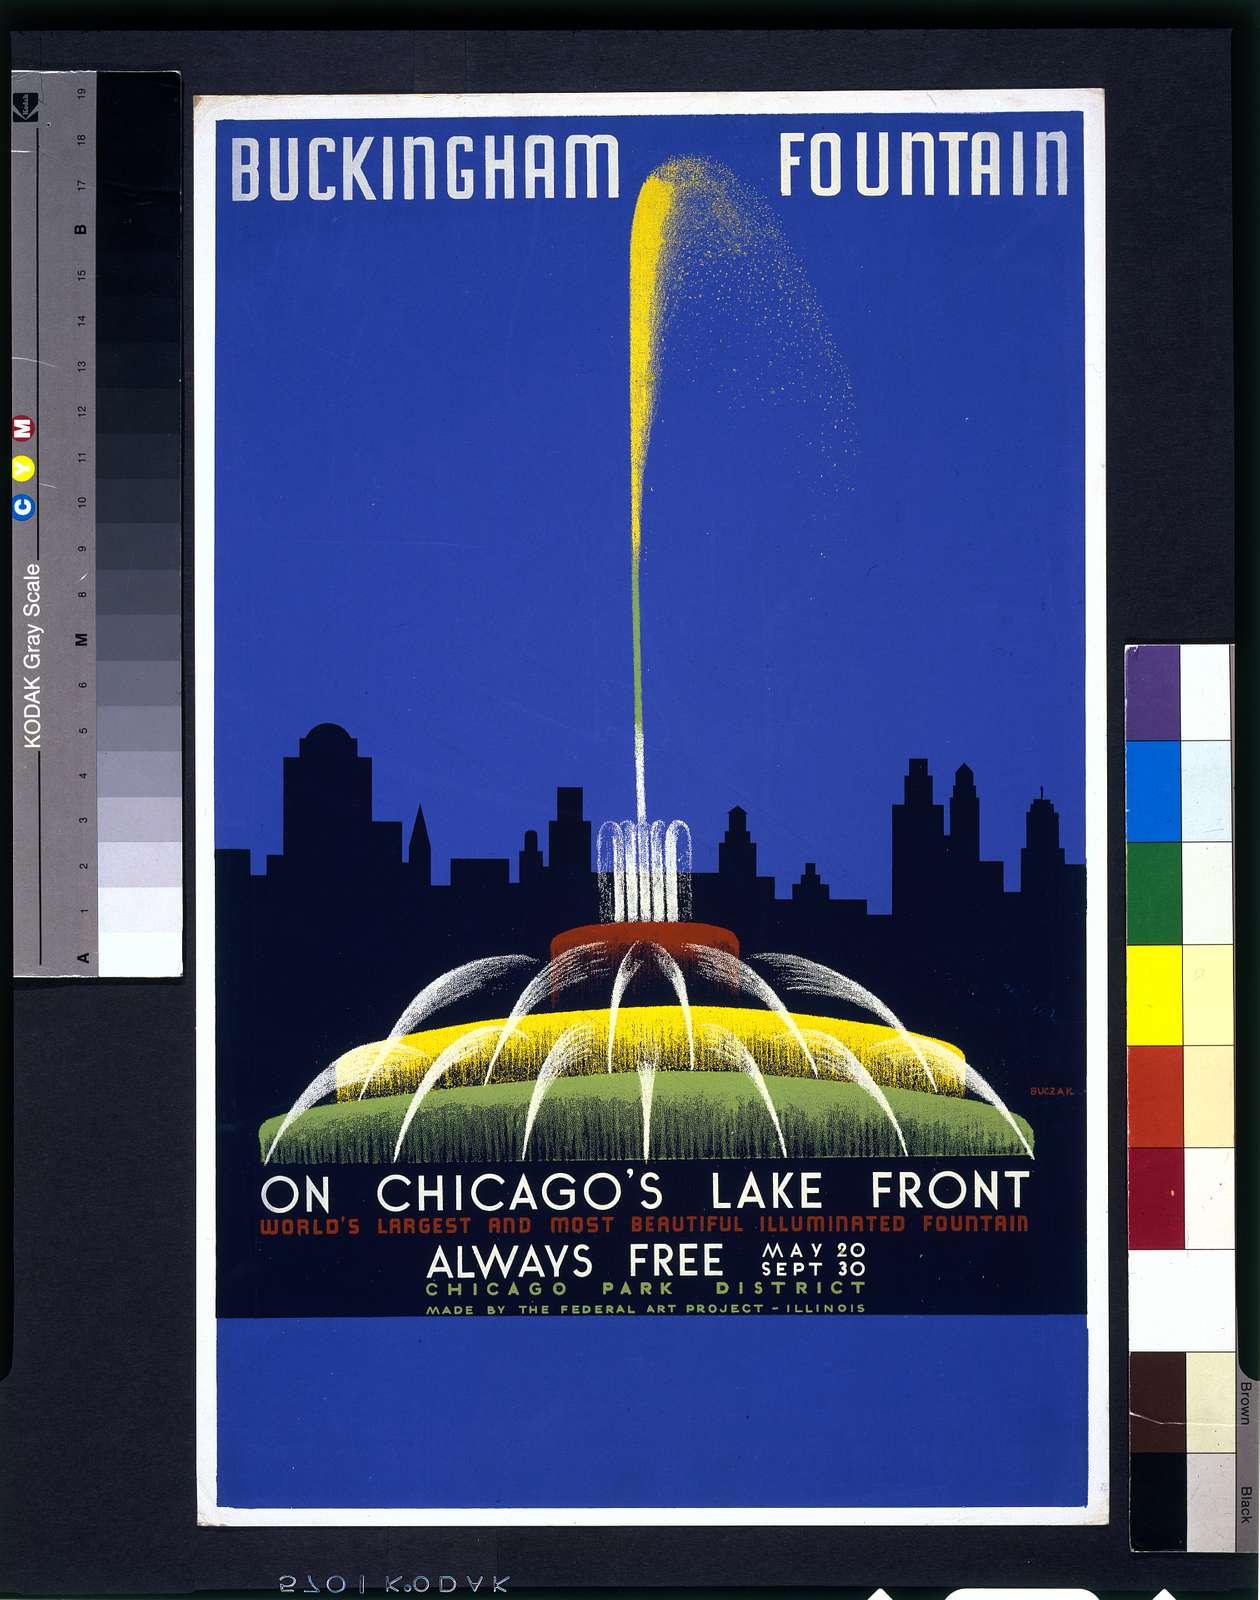 Buckingham Fountain on Chicago's lake front, world's largest and most beautiful illuminated fountain ... / Buczak.